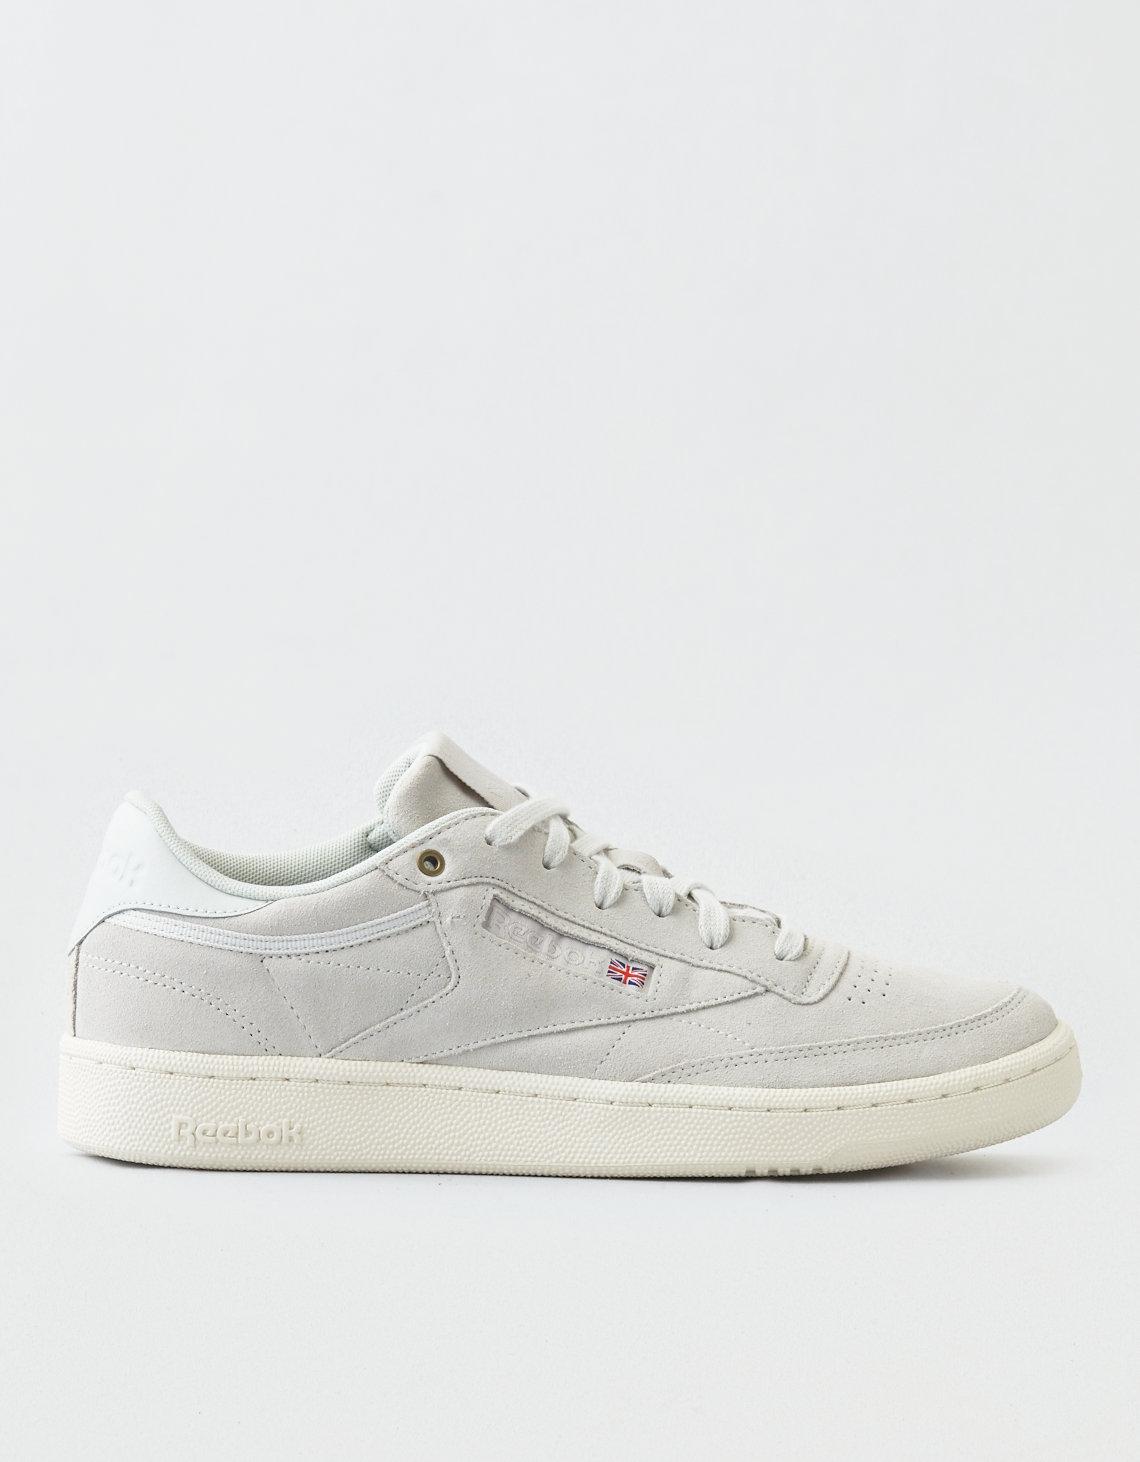 9f156886228 Reebok Club C 85 MCC Sneaker. Placeholder image. Product Image